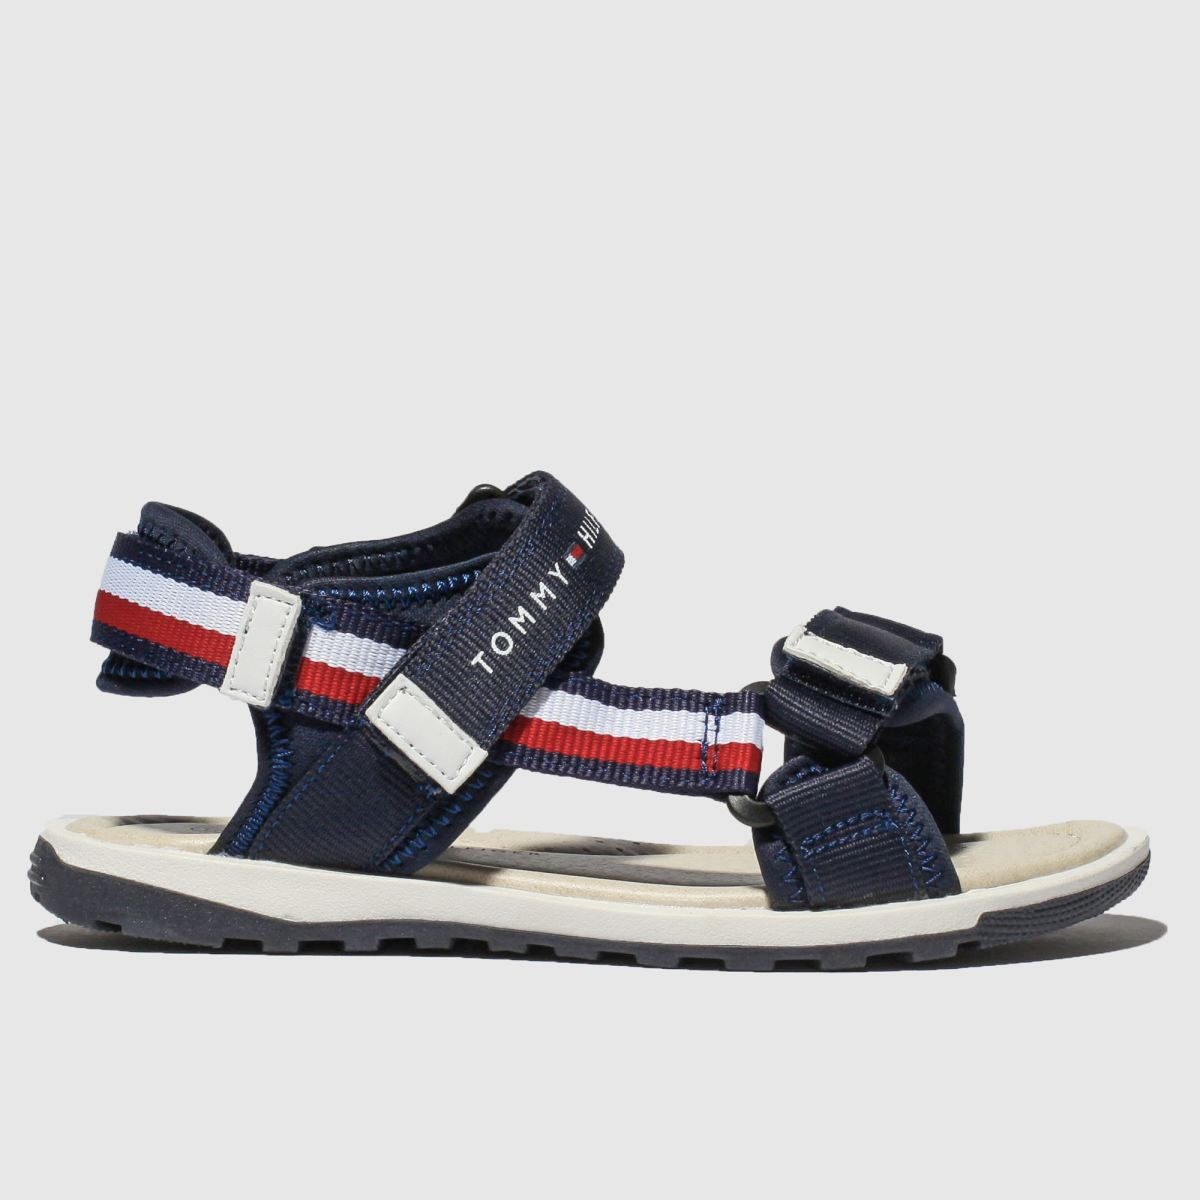 Tommy Hilfiger Navy & White Velcro Sandal Sandals Youth